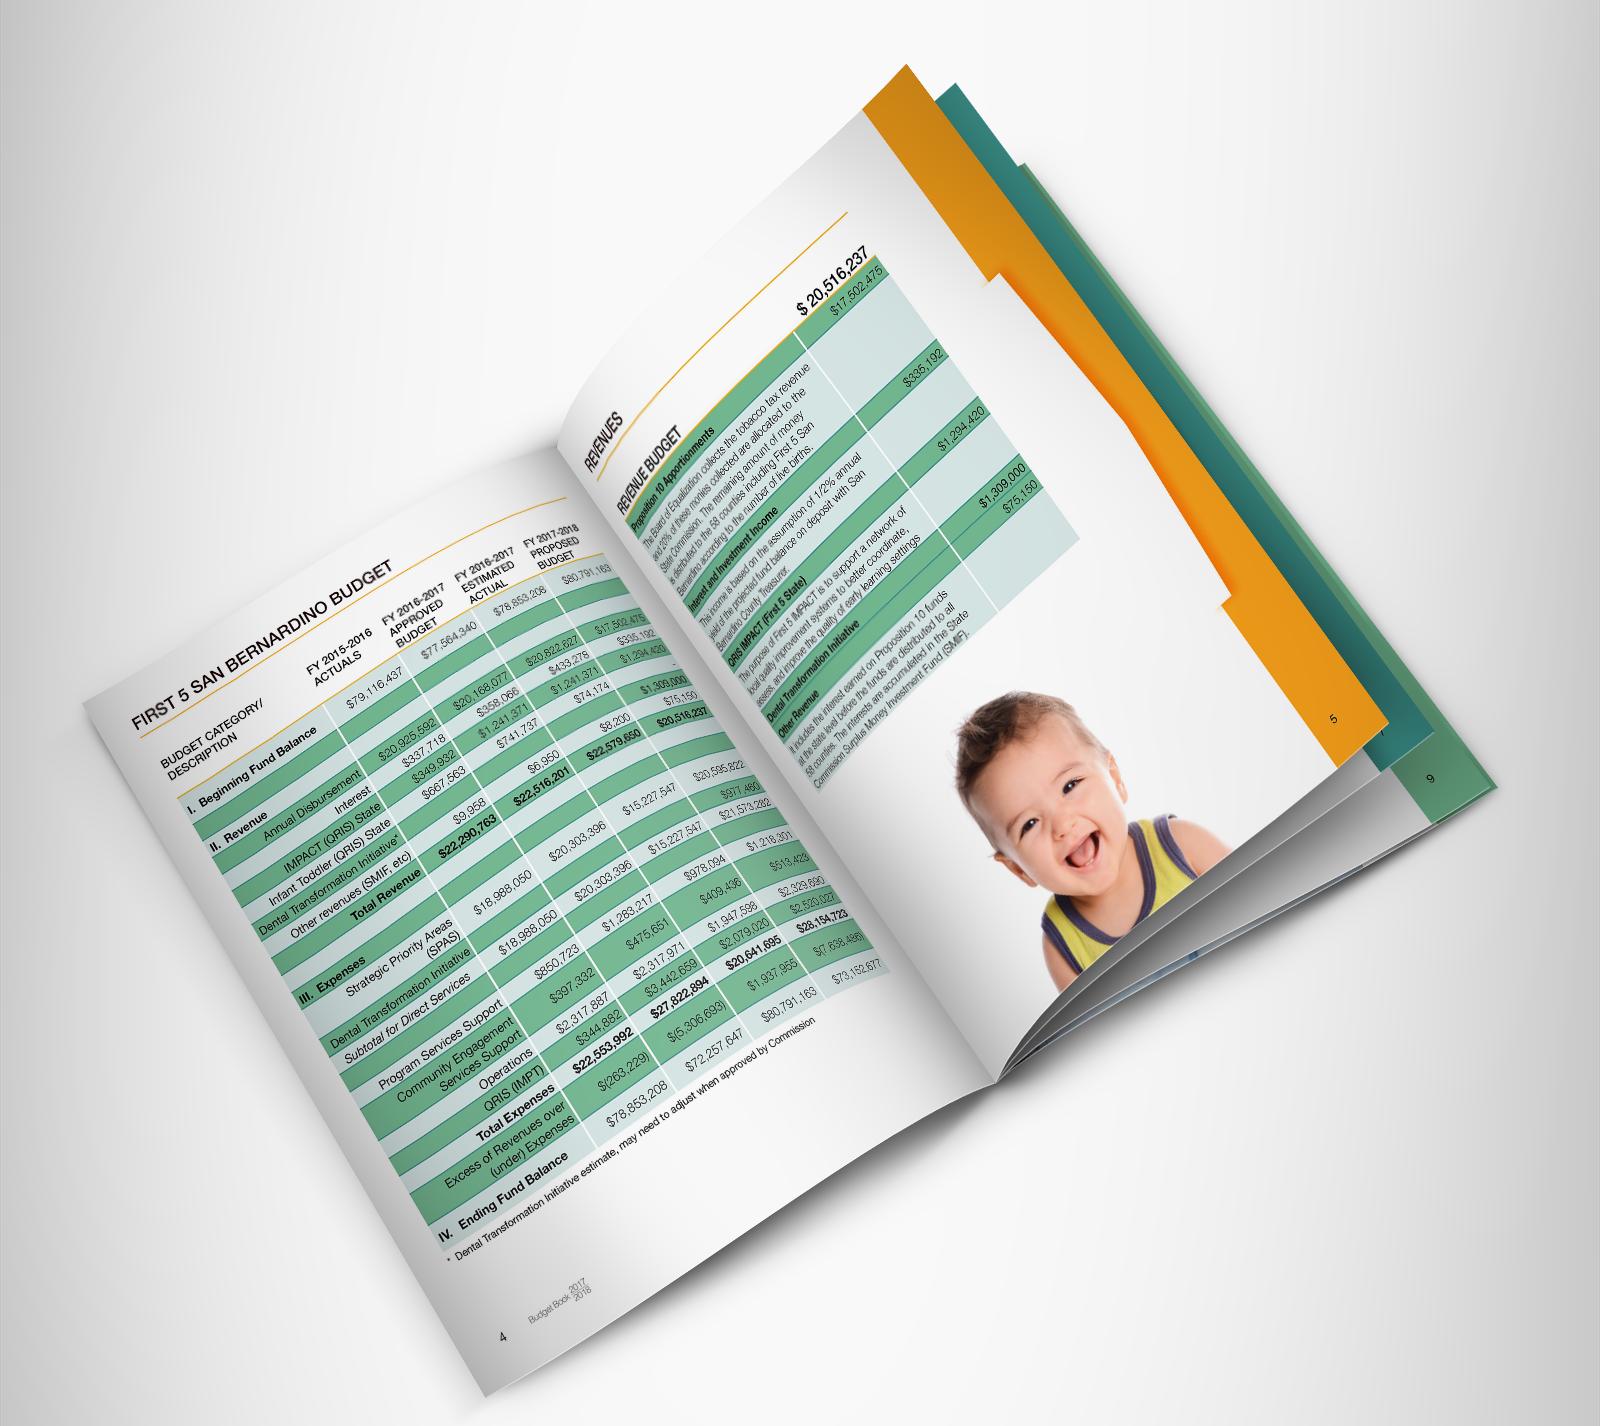 BudgetBookSpreadMockUp1.png